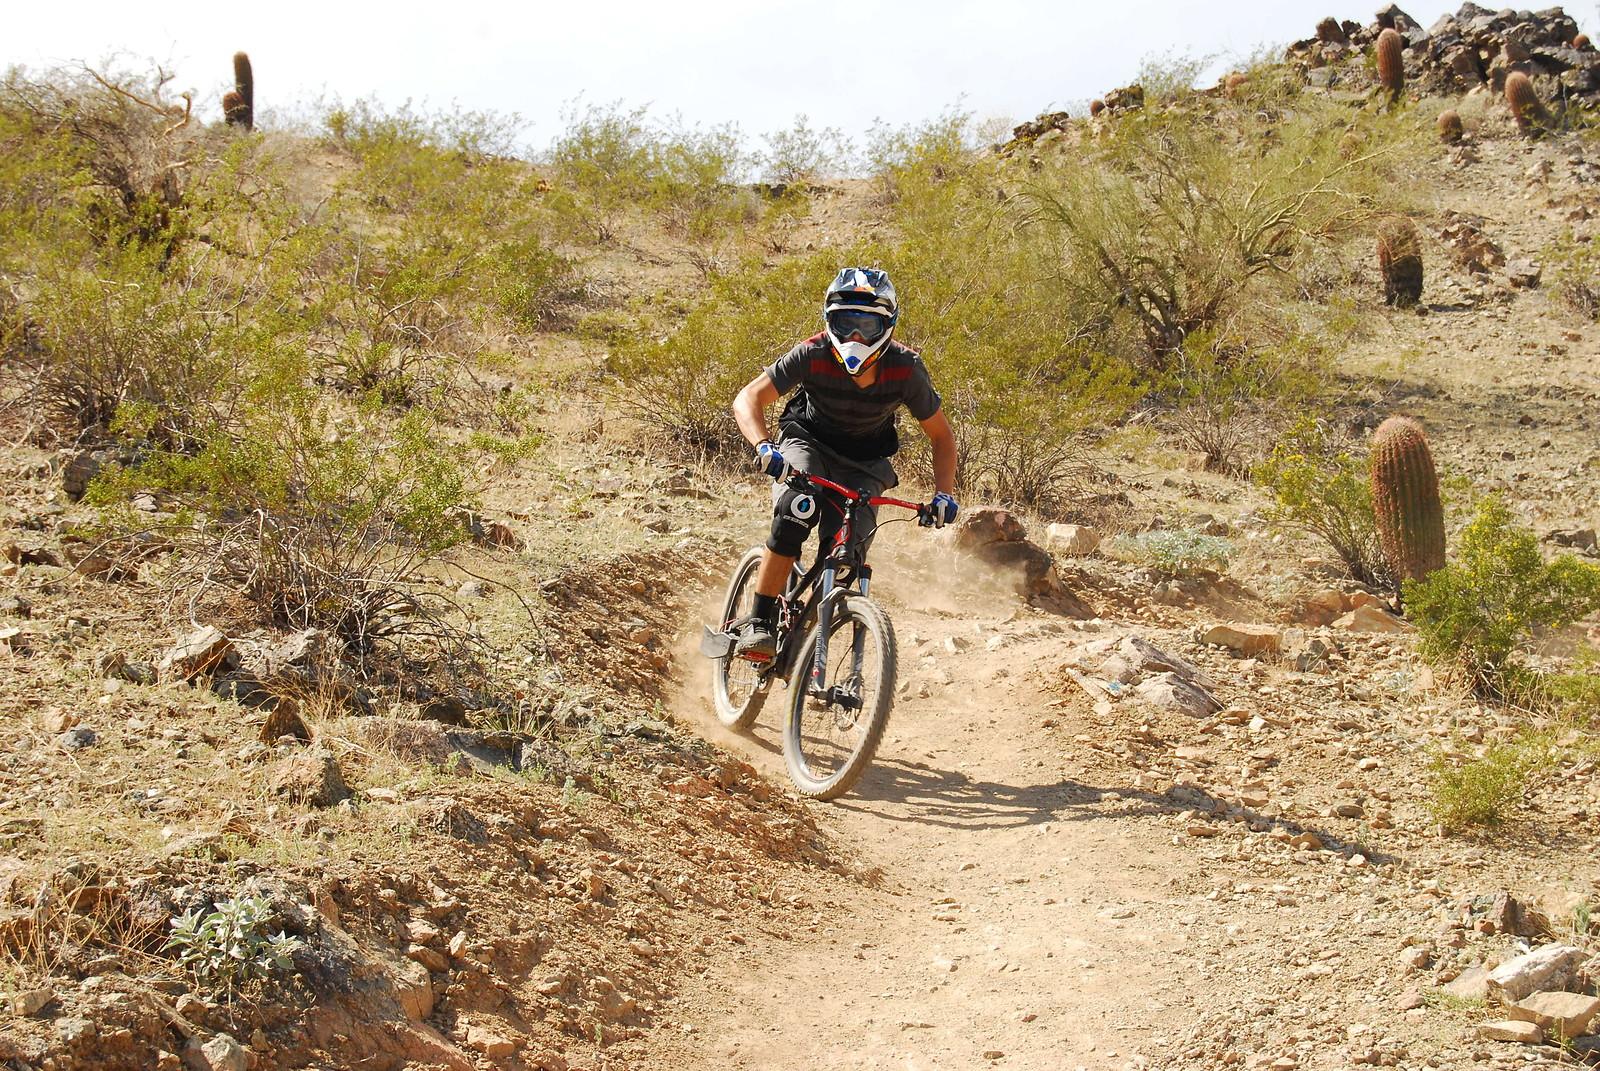 DSC 0398 - Enter Motion - Mountain Biking Pictures - Vital MTB